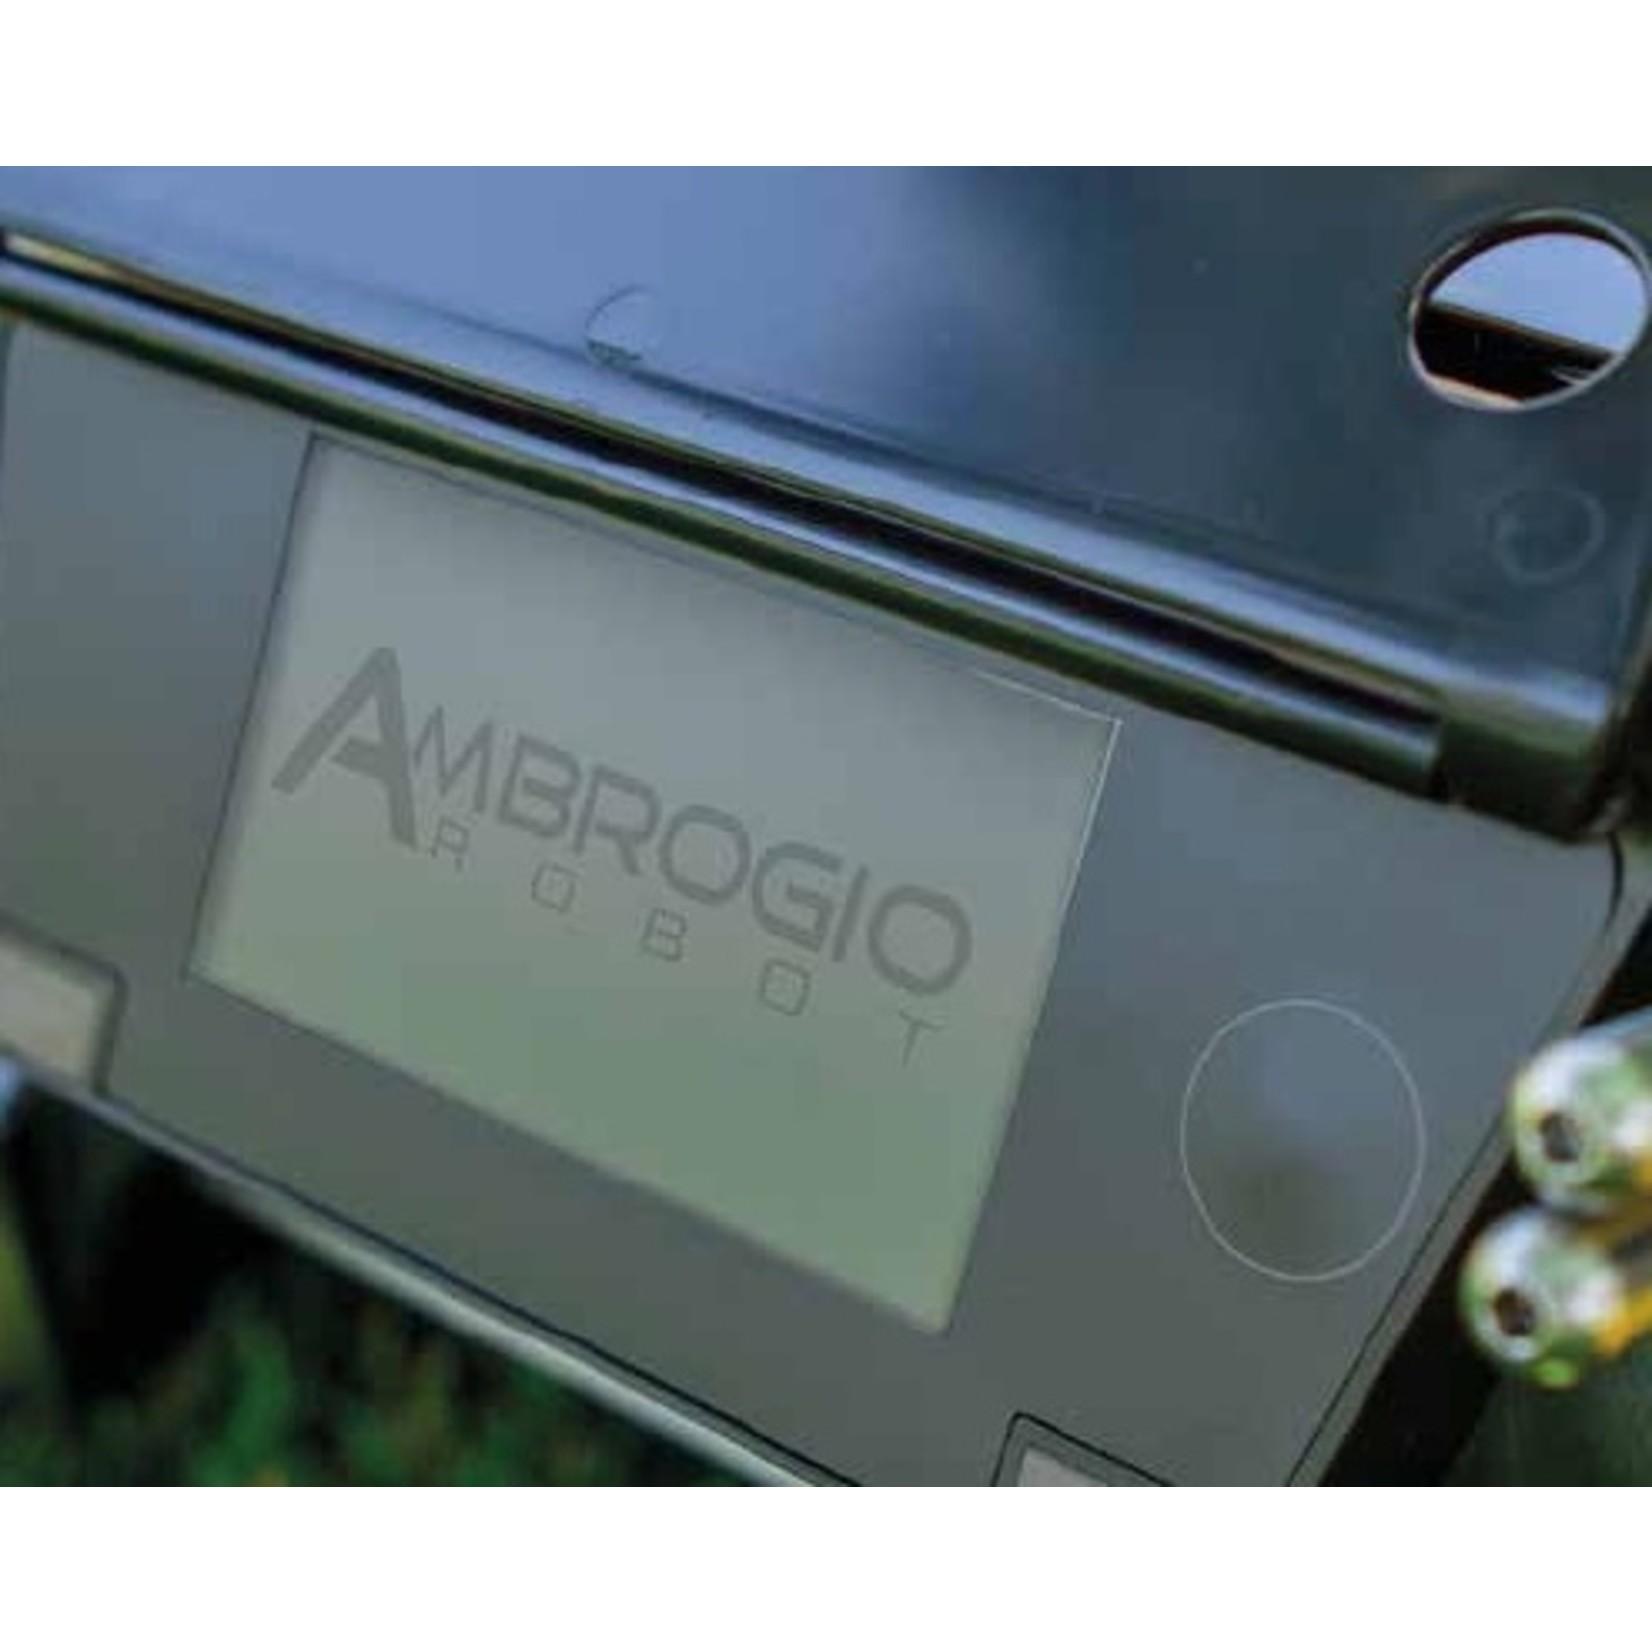 Ambrogio Ambrogio Proline L350i Elite Rasenmähroboter Modell 2021